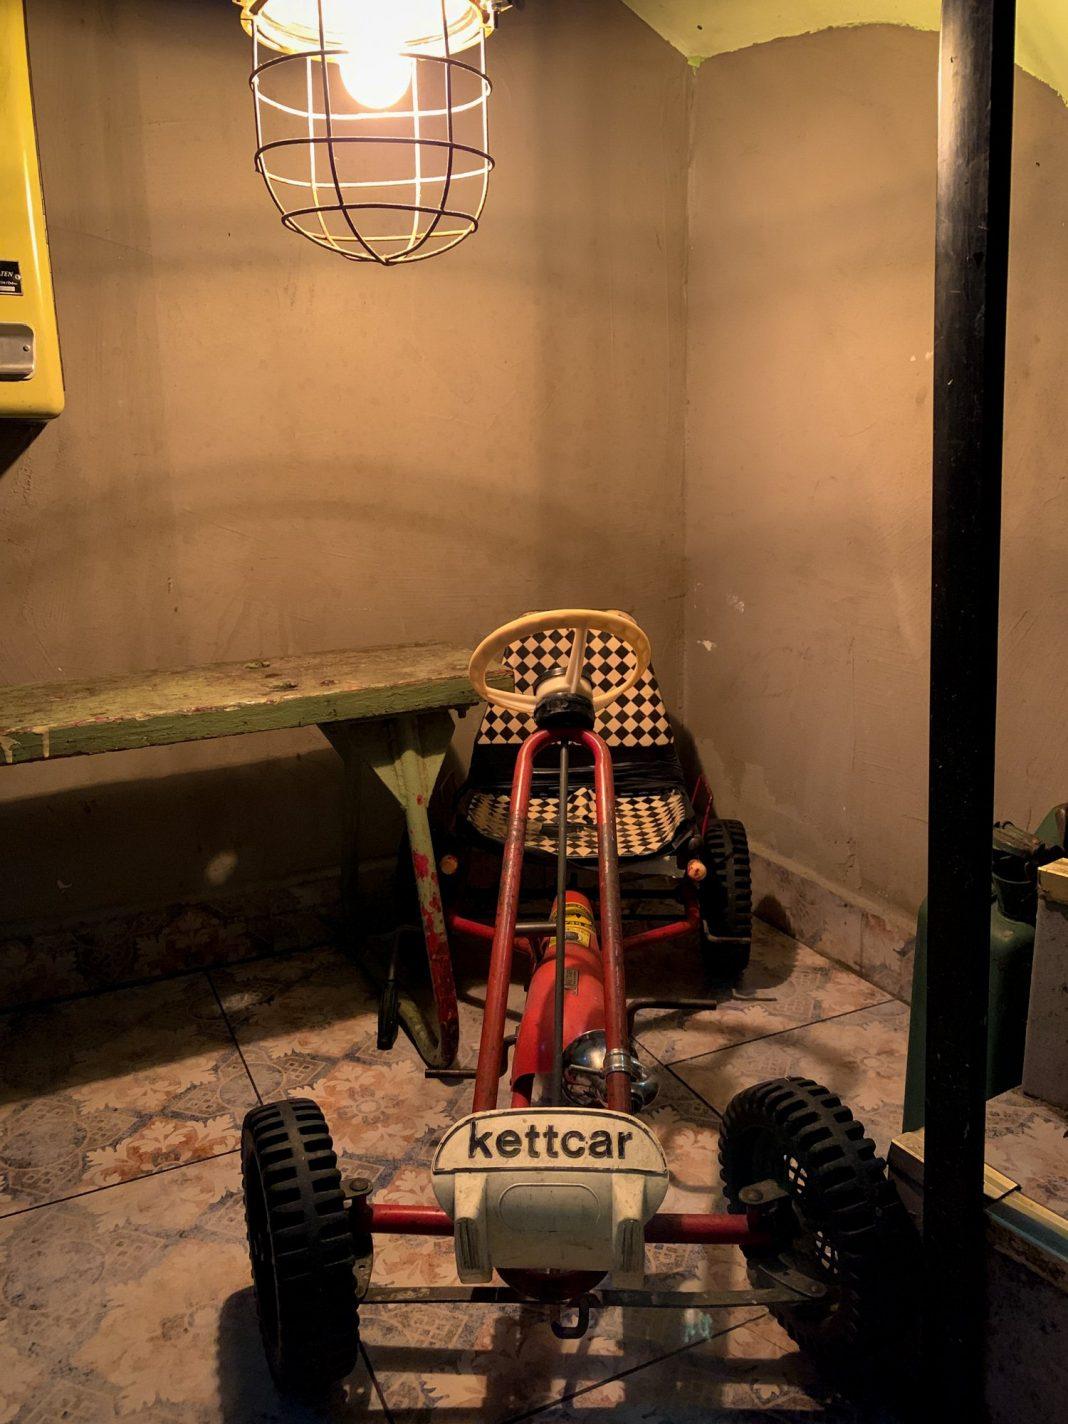 Foto: Kettcar im Keller vom Herr Pimock